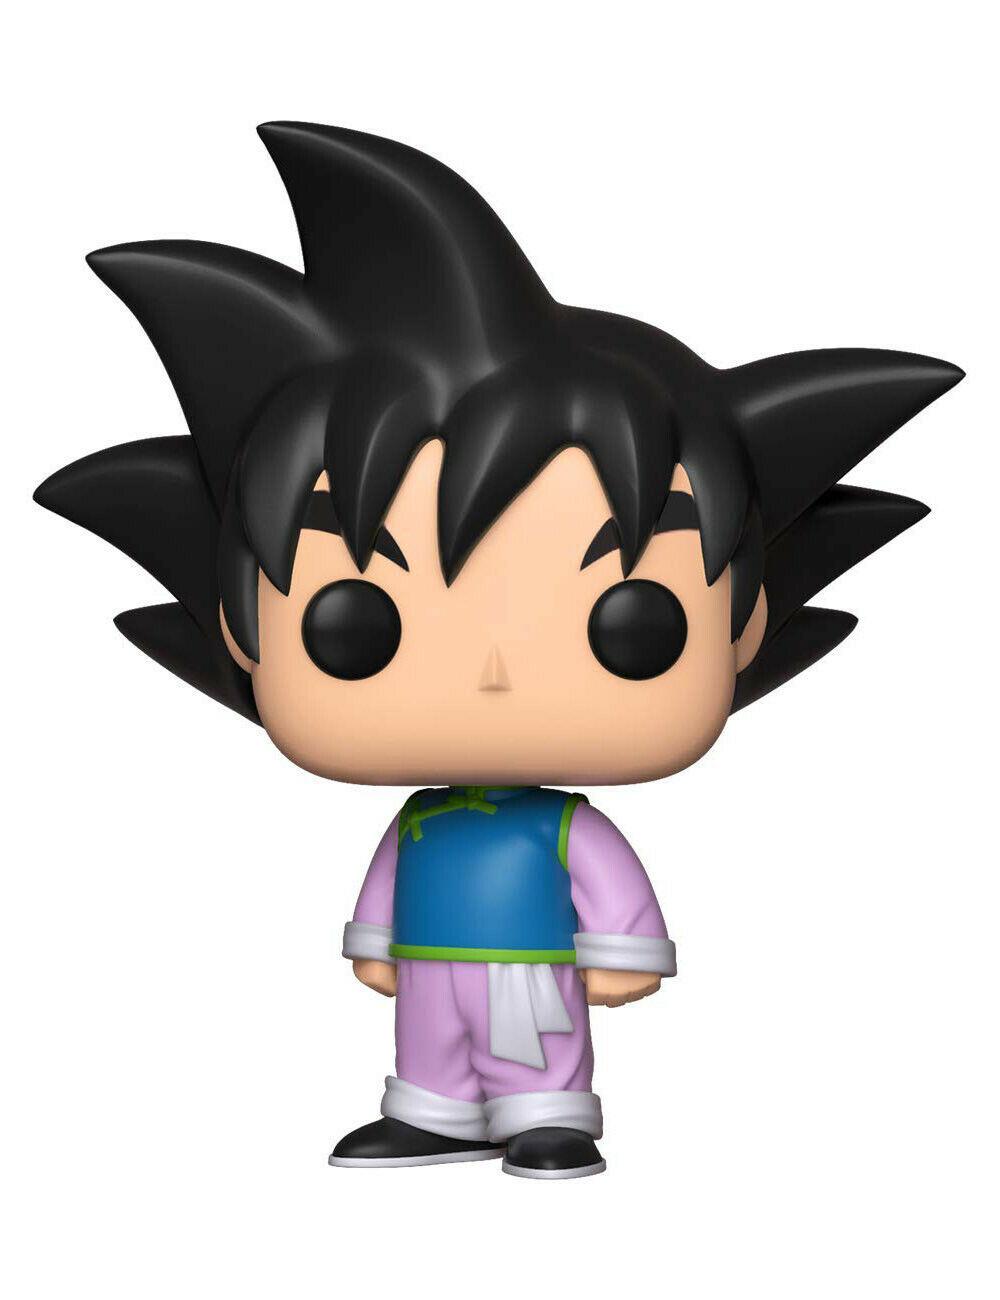 Funko POP! - Animation: Dragon Ball Z S6 - Goten